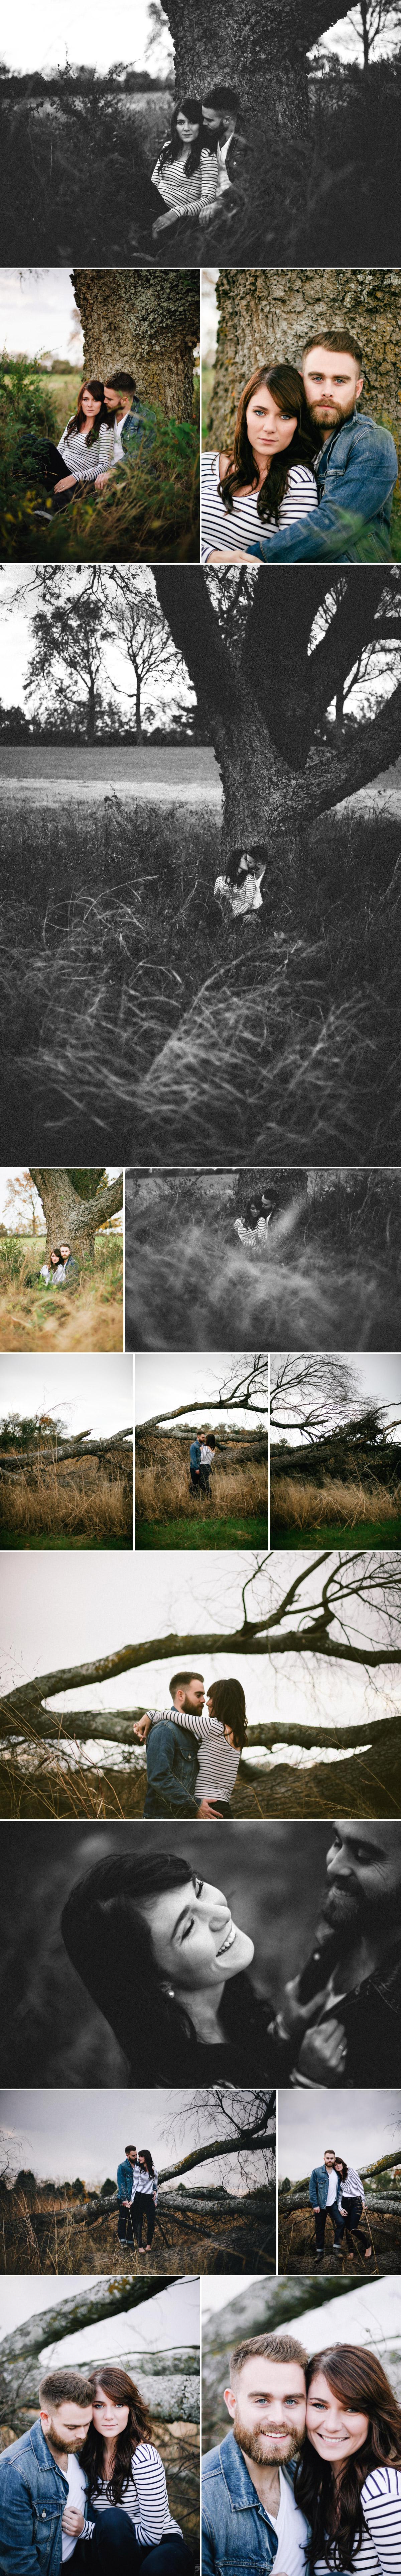 Blog-Collage-1383704791182.jpg